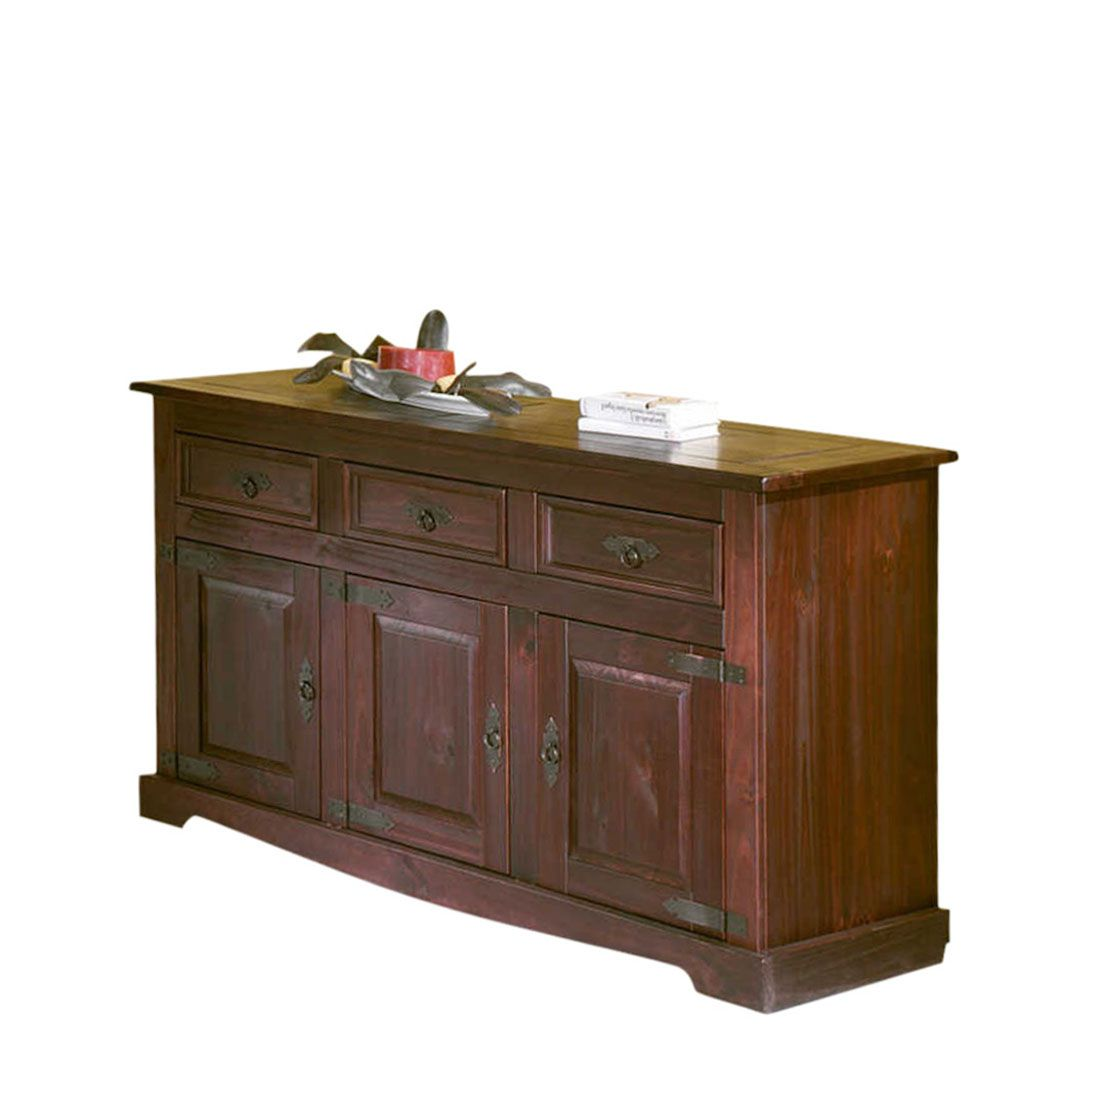 Sideboard san carlos iii massivholz kiefer kolonial for Sideboard kolonial